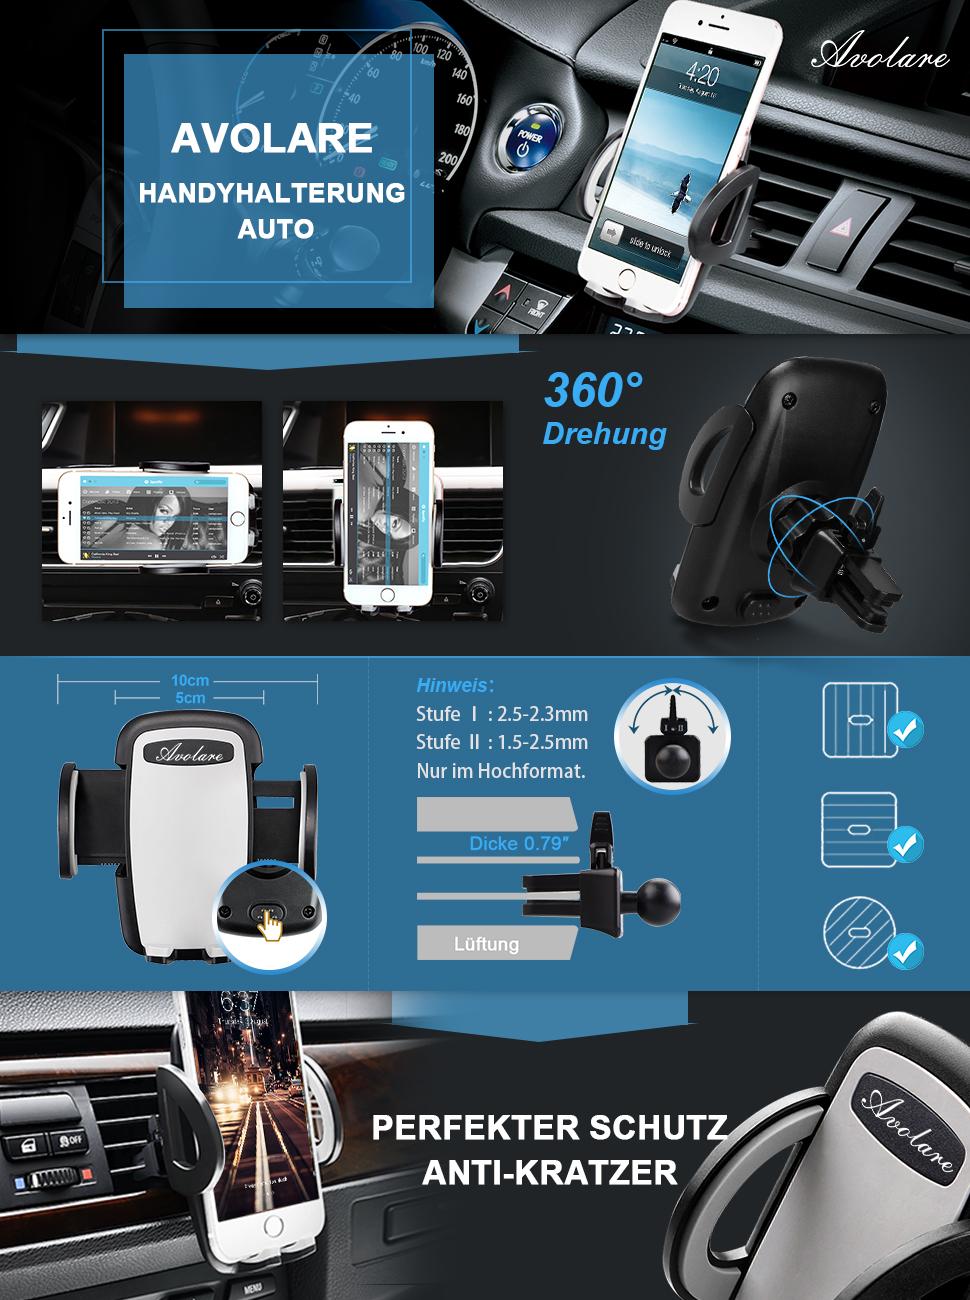 avolare handyhalterung auto handyhalter f rs auto l ftung. Black Bedroom Furniture Sets. Home Design Ideas